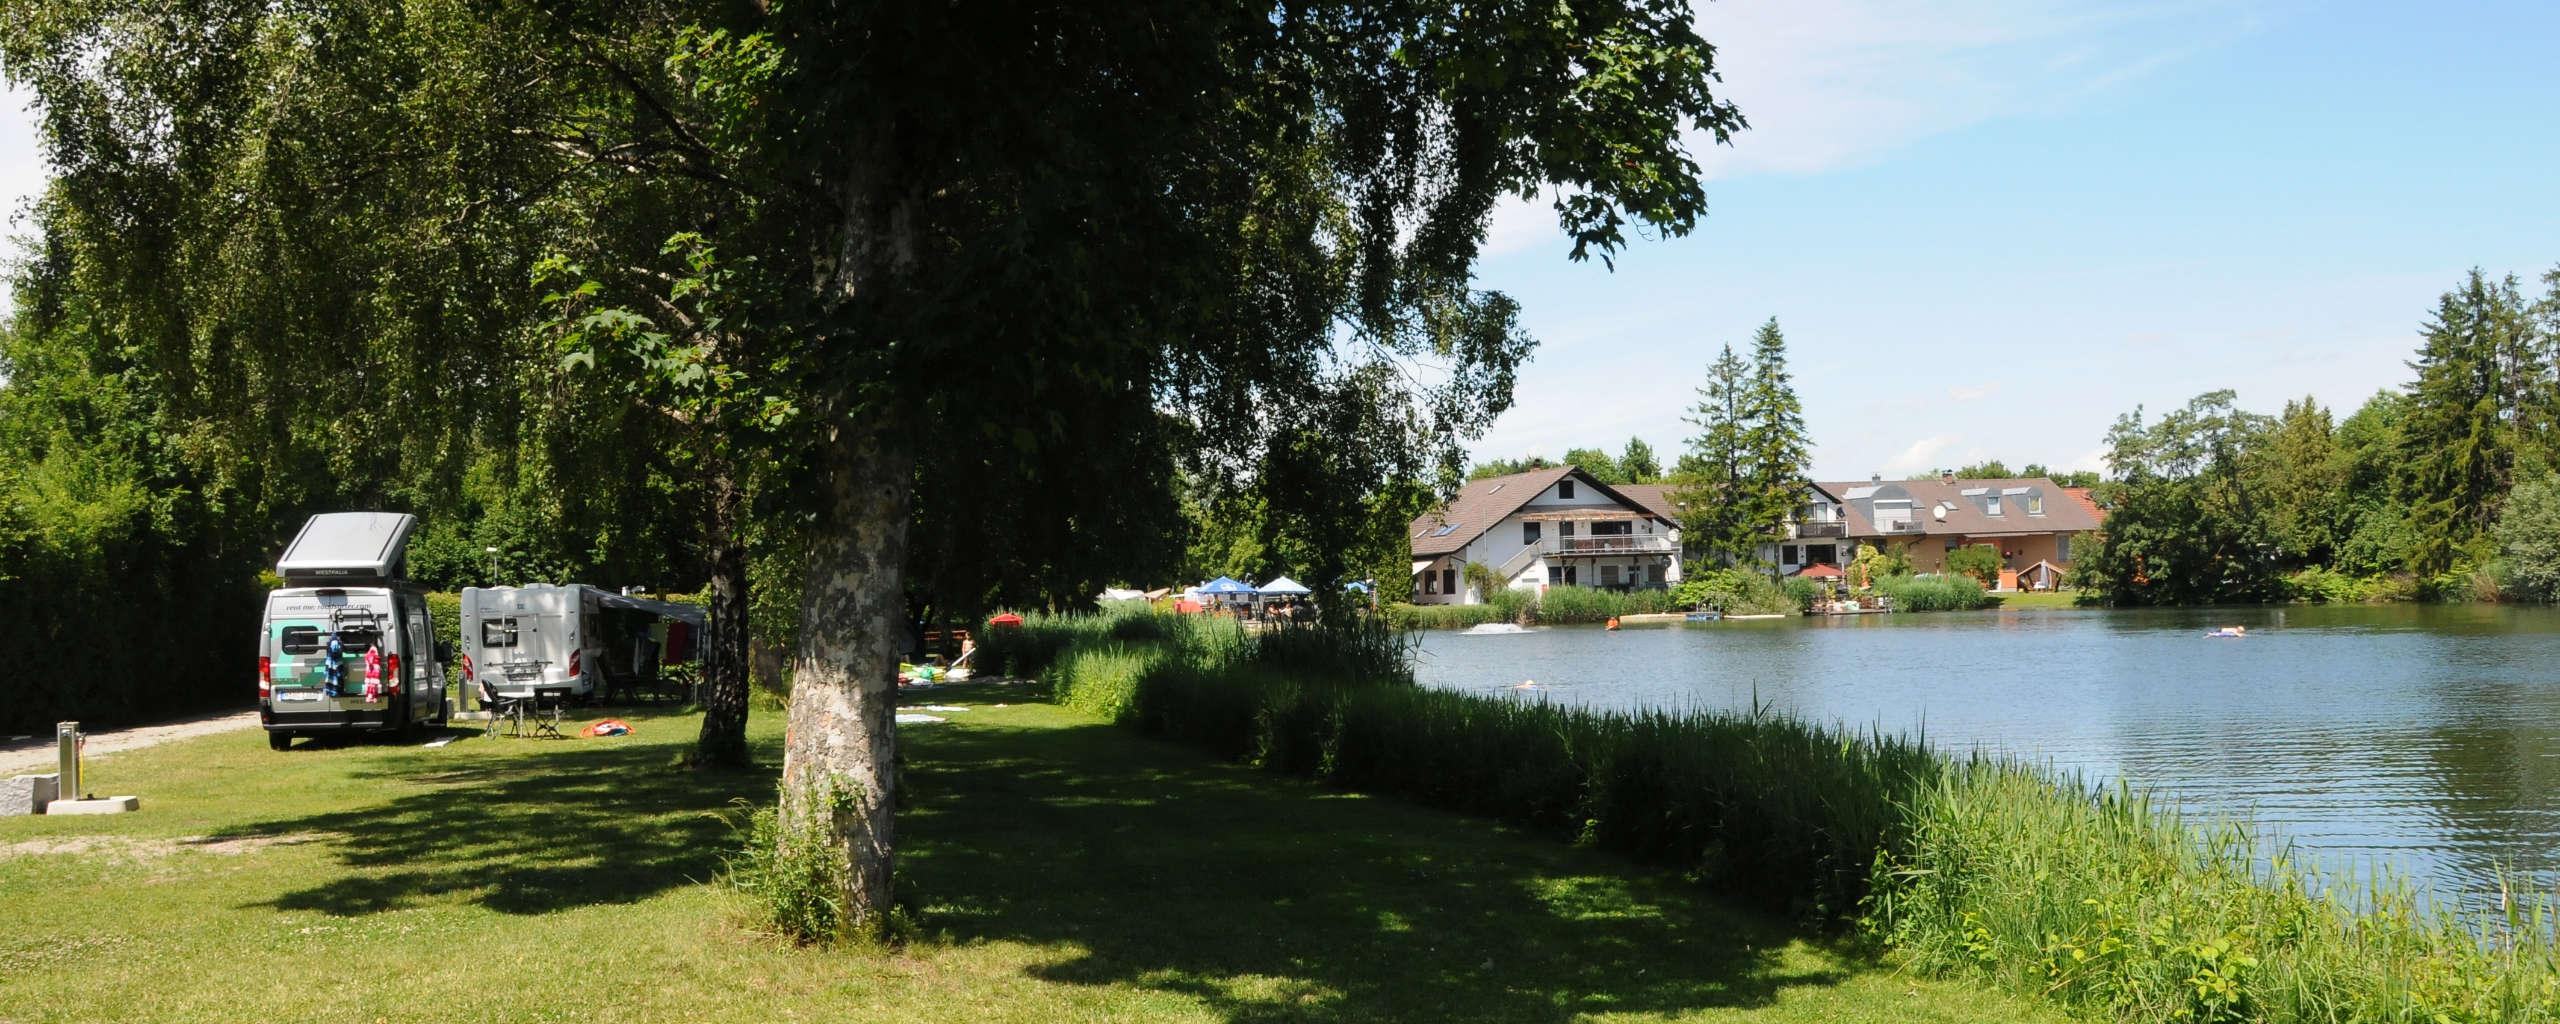 Lech-Camping-Augsburg-Campingplatz-Header-See-1